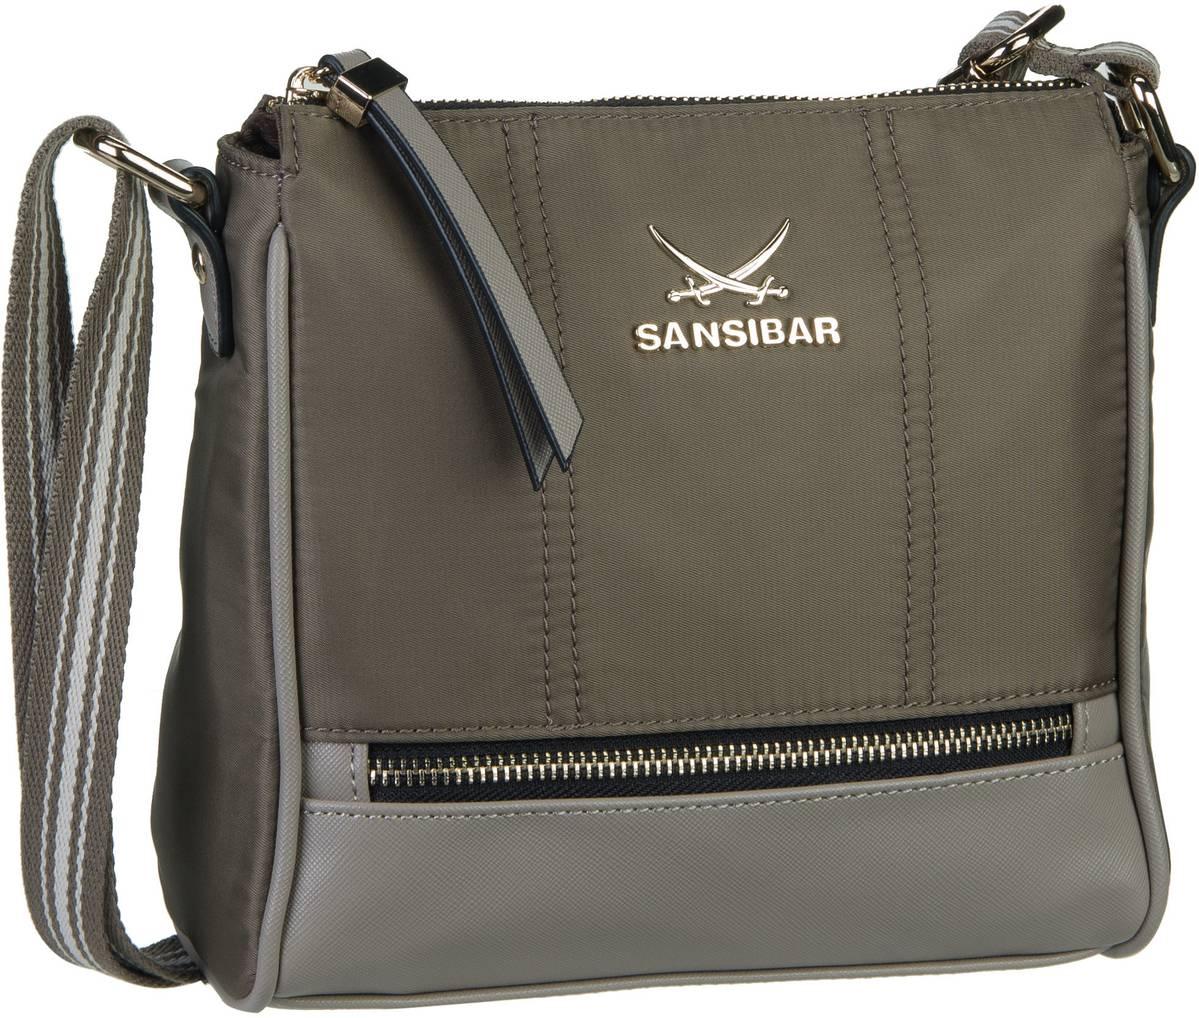 Umhängetasche Zip Bag 1272 Sand